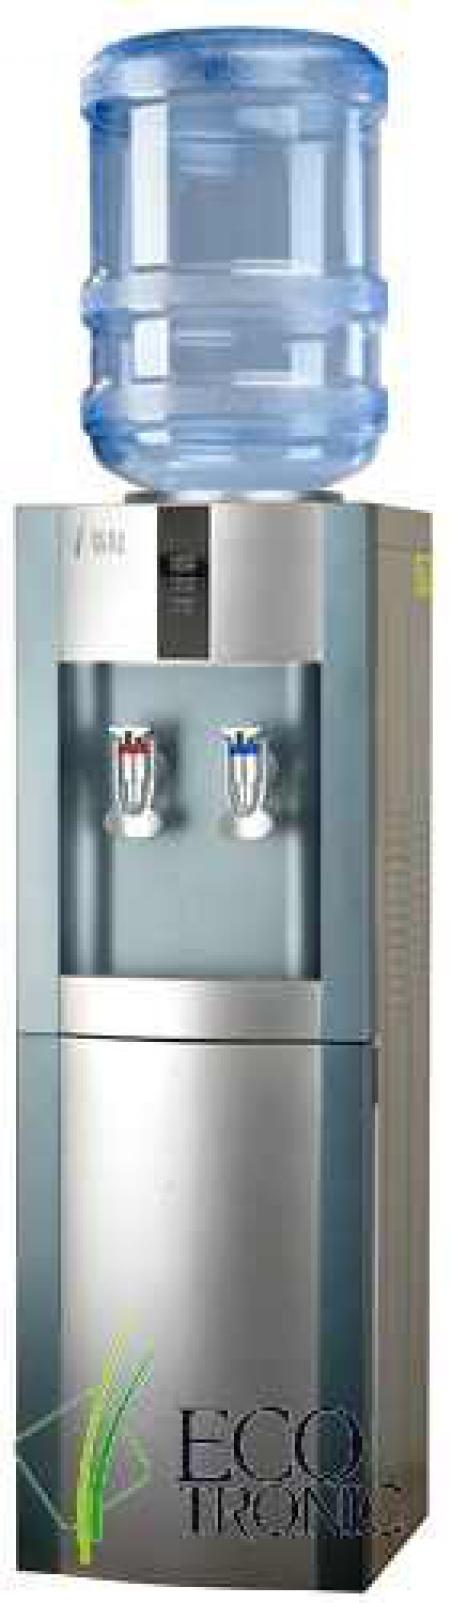 Кулер для воды Ecotronic H10-L - 150